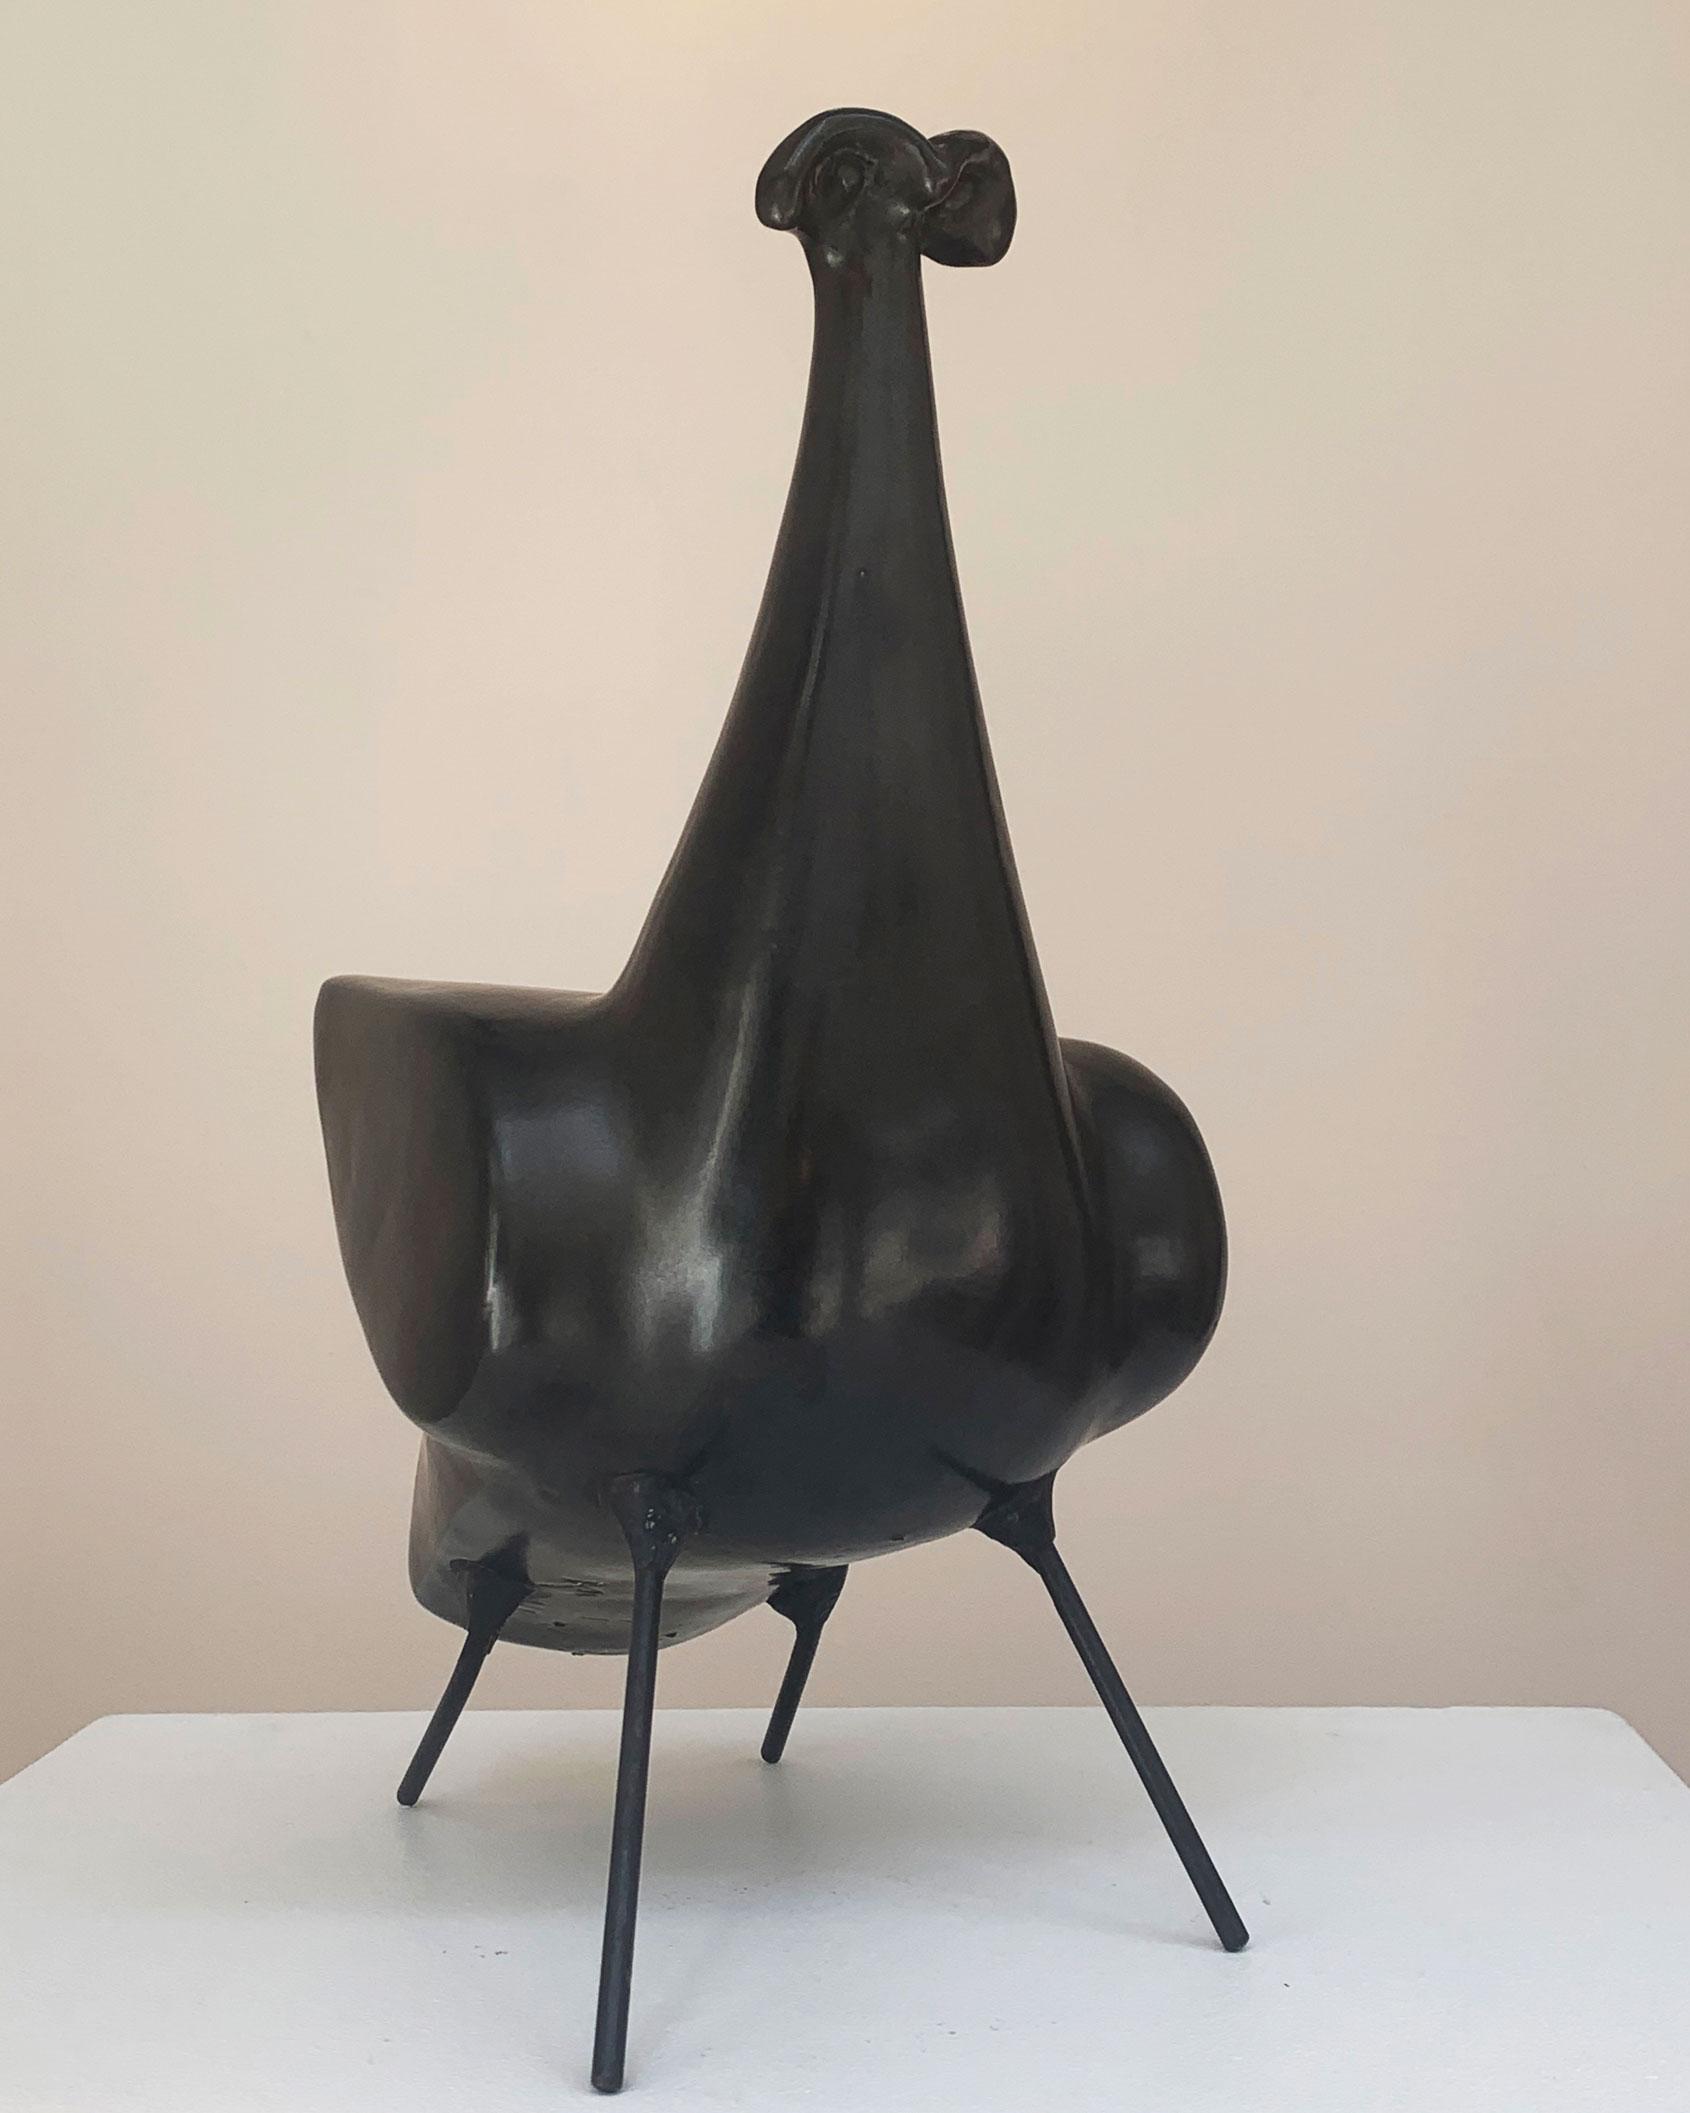 Georges Jouve, «4-legs bird» ceramic sculpture, vue 02